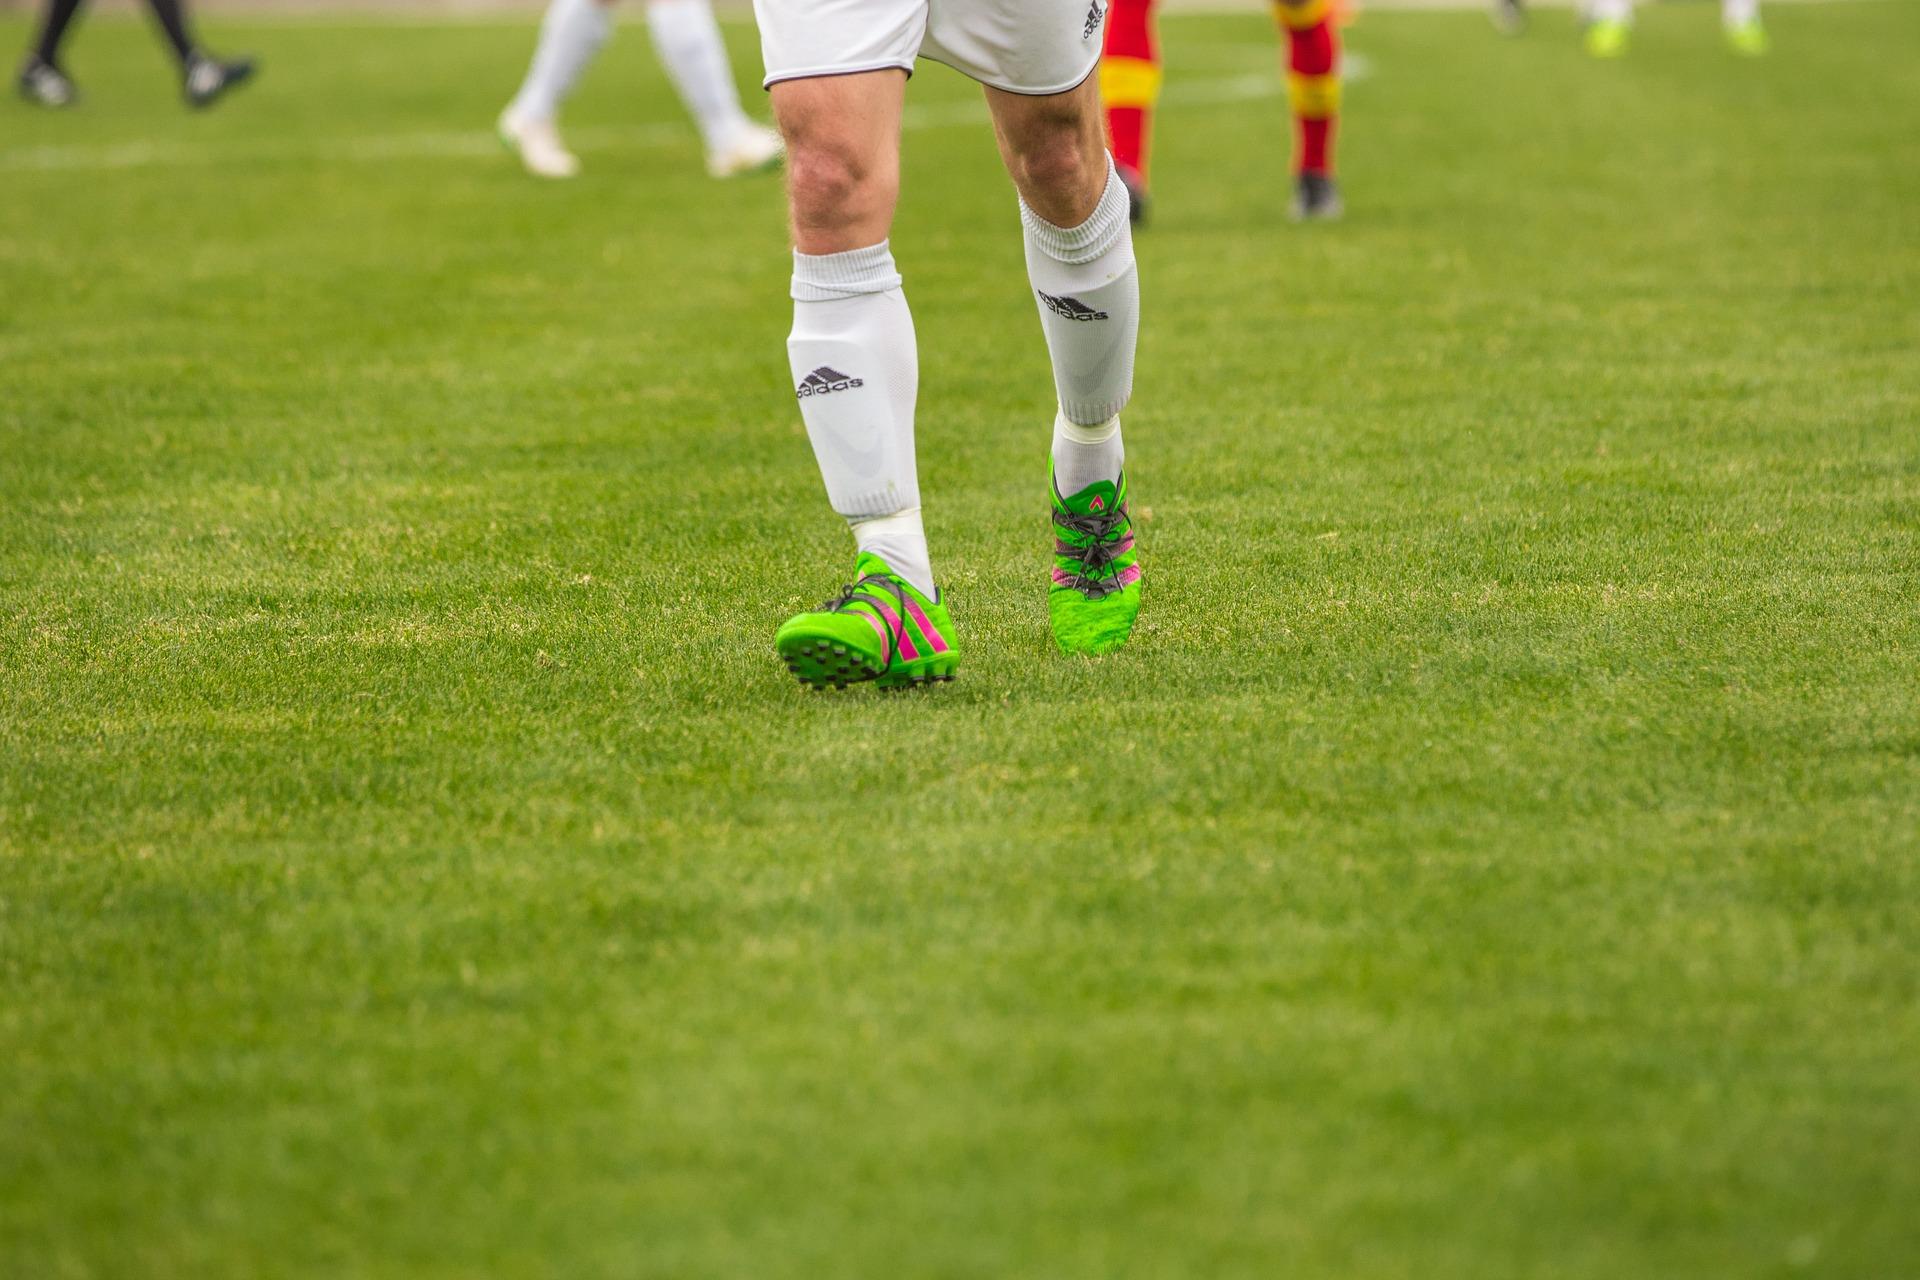 Kreispokal C/D – 2. Runde – SG Mehlental II – SG Darscheid II (1:0)